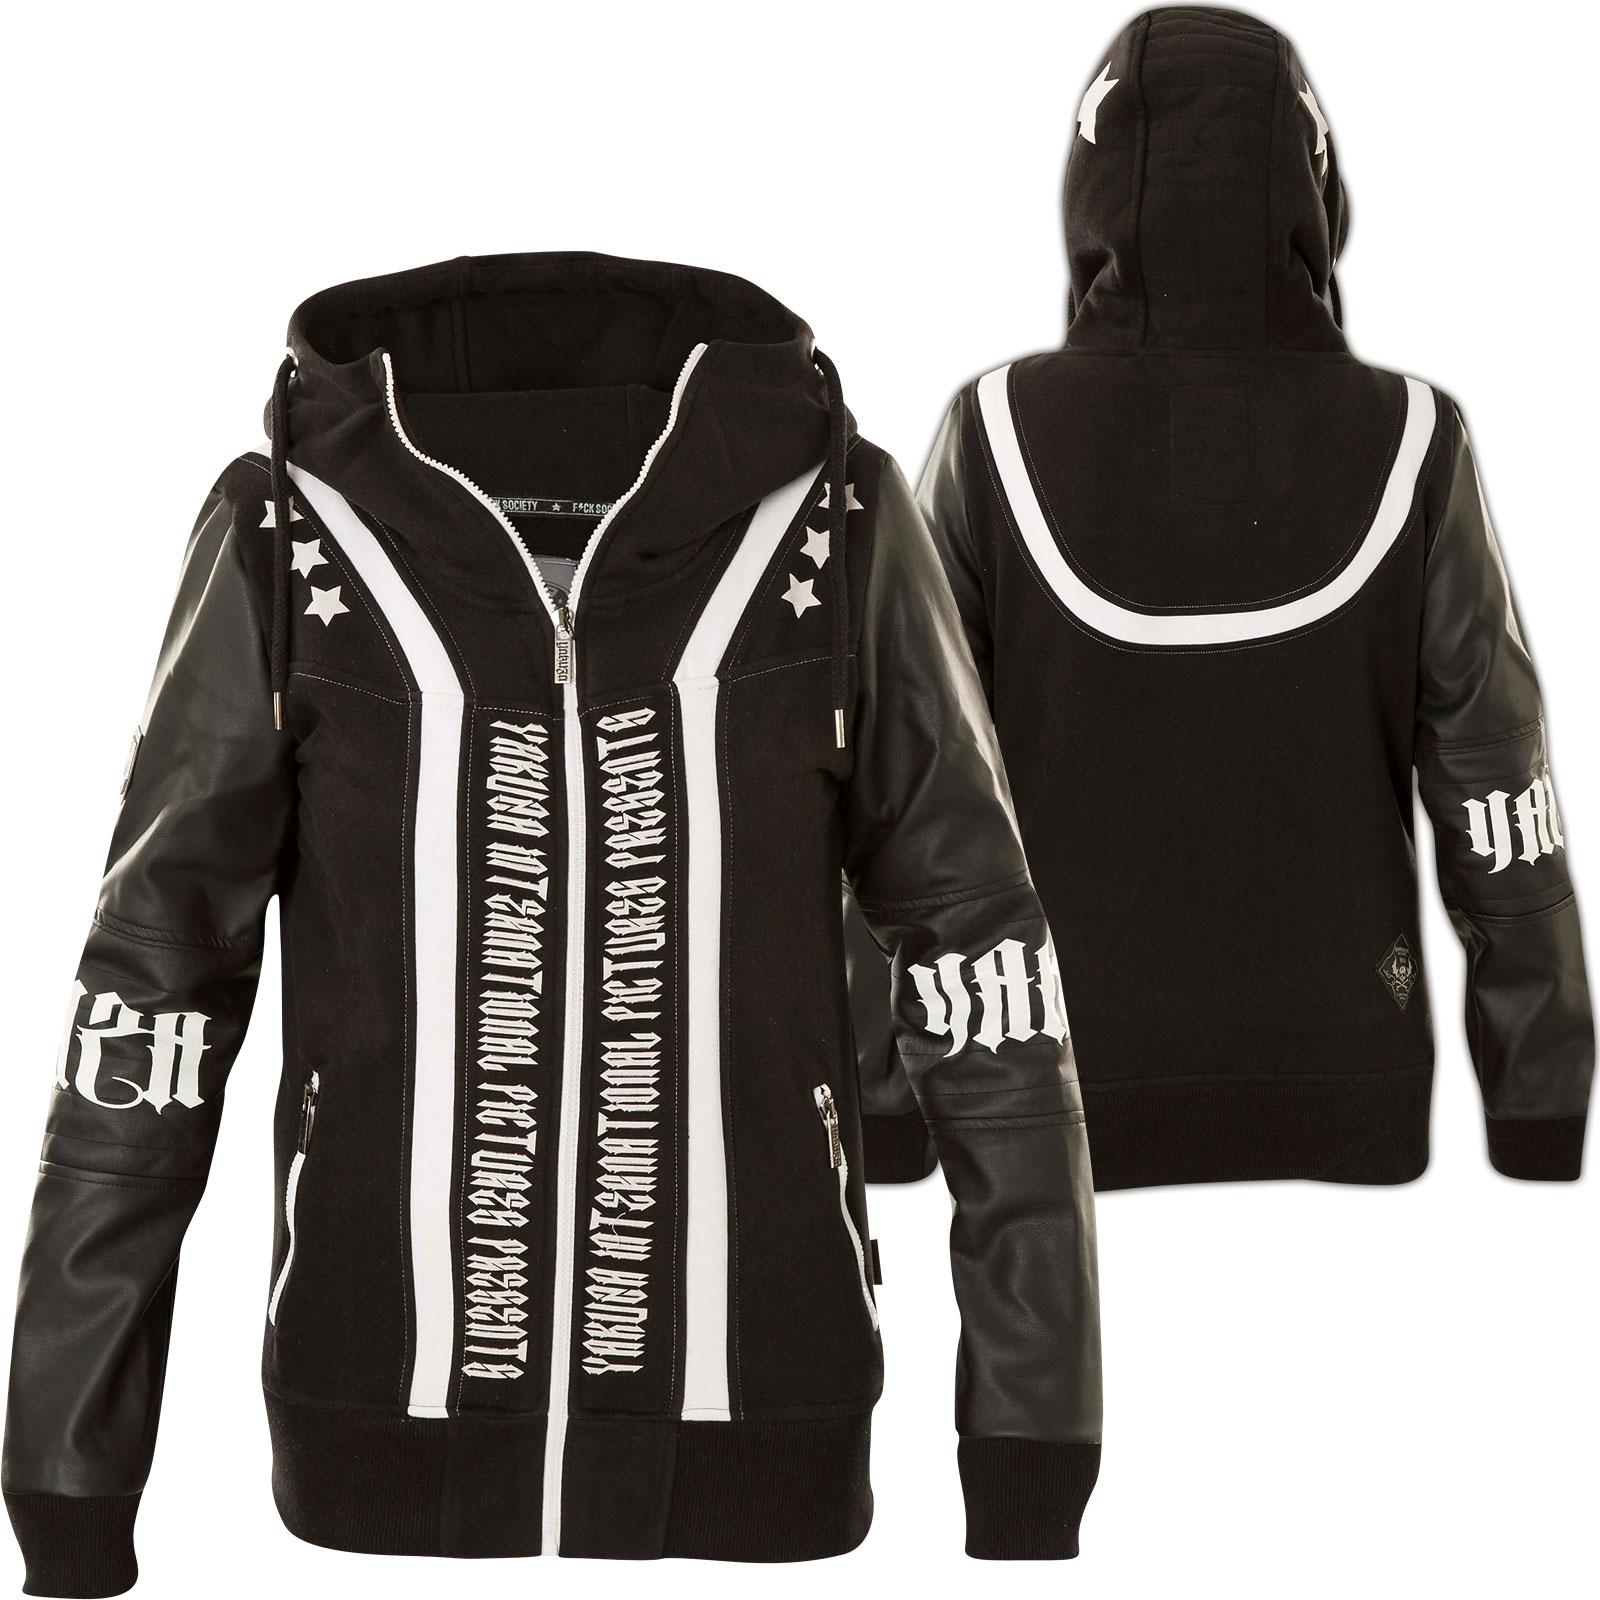 Yakuza Mix Daily Jacket 11110 Neck Hooded Hoody Black Woman Use Gjb High 0X8wOnPkN